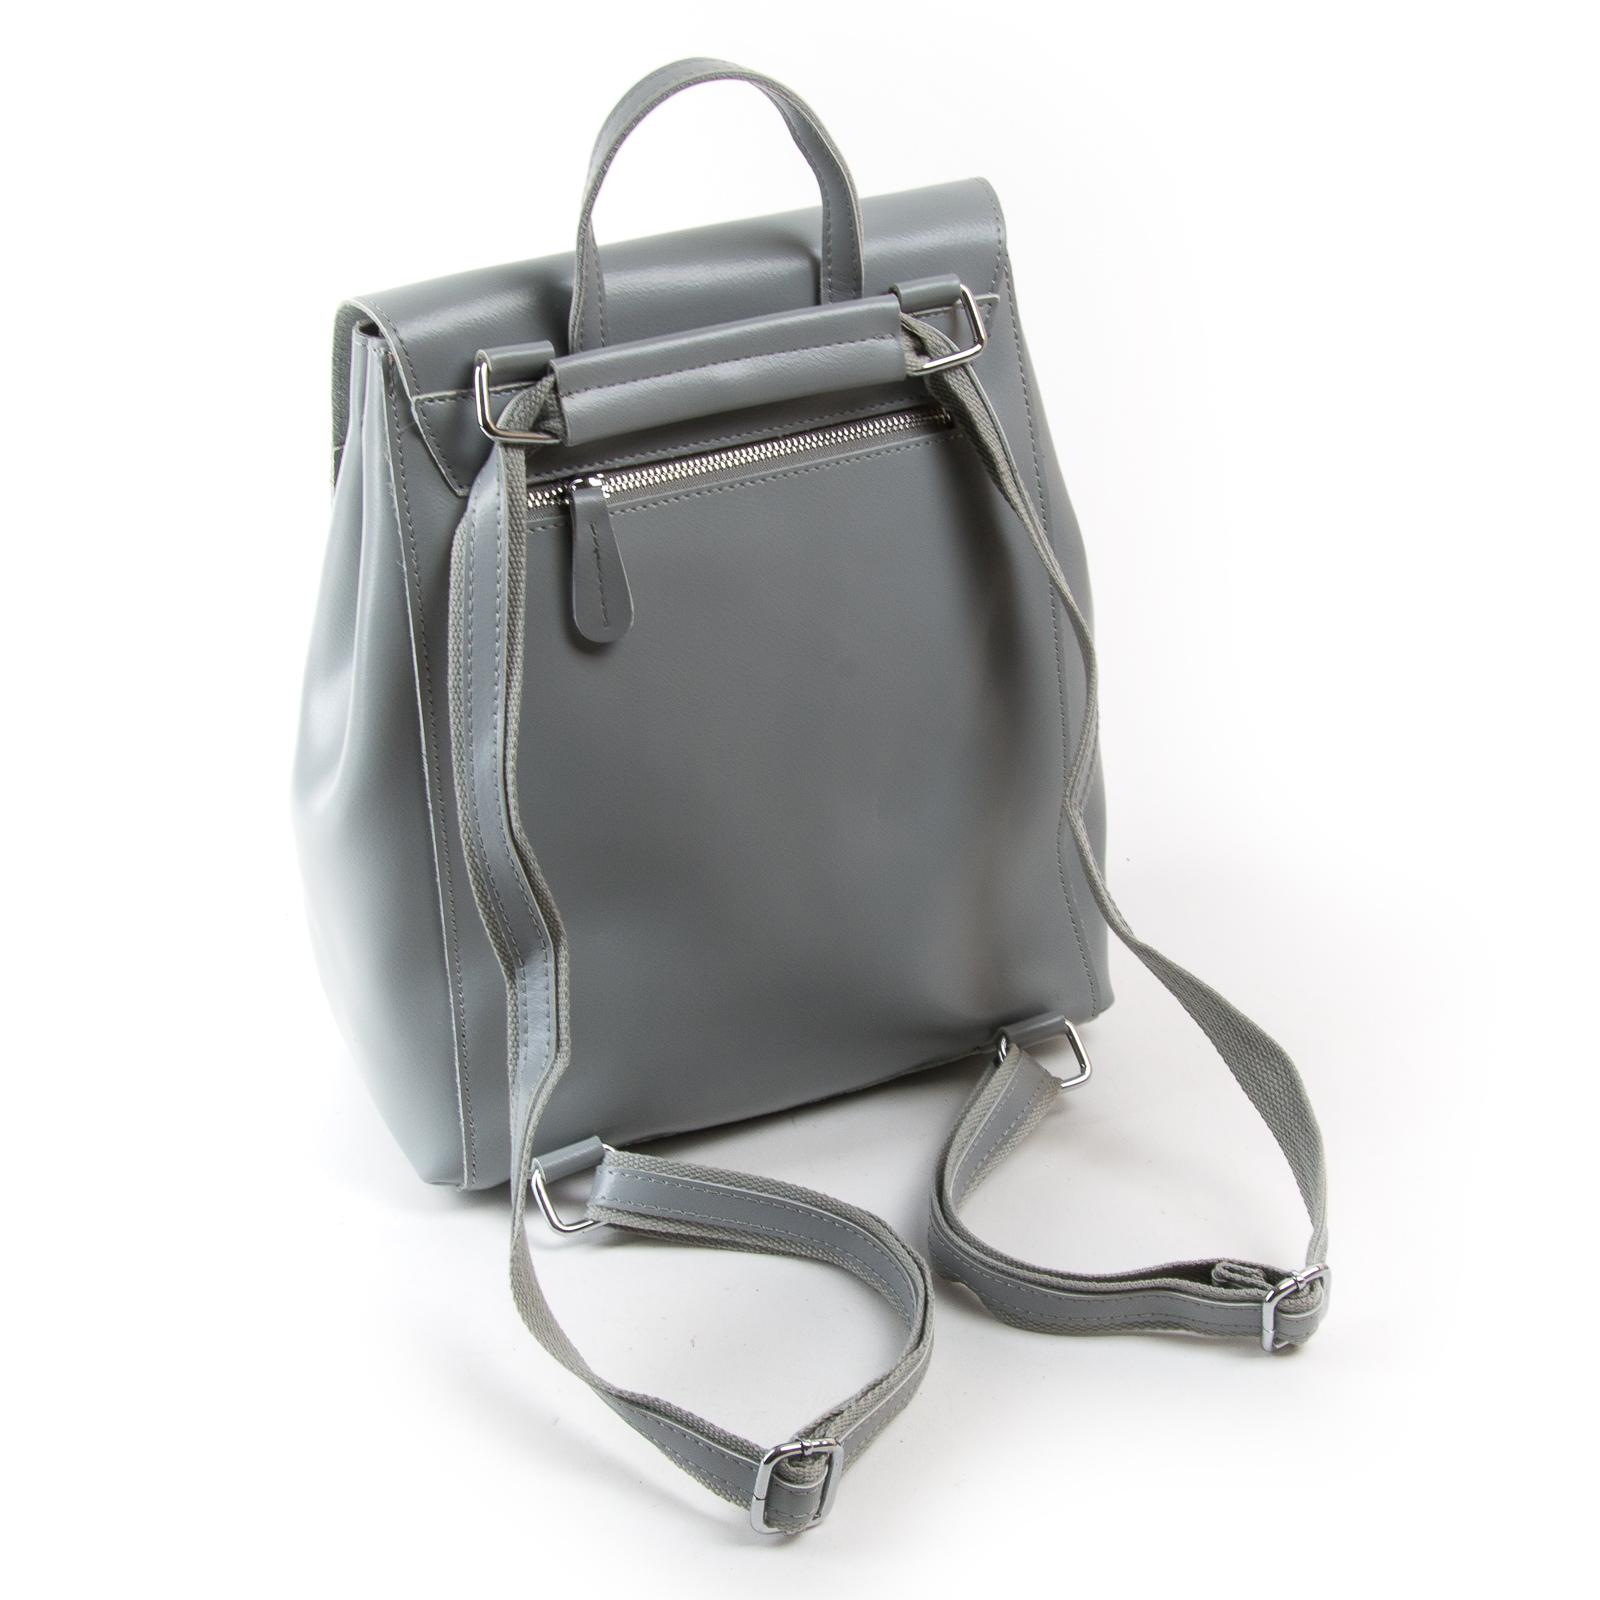 Сумка Женская Рюкзак кожа ALEX RAI 373 l-grey - фото 4